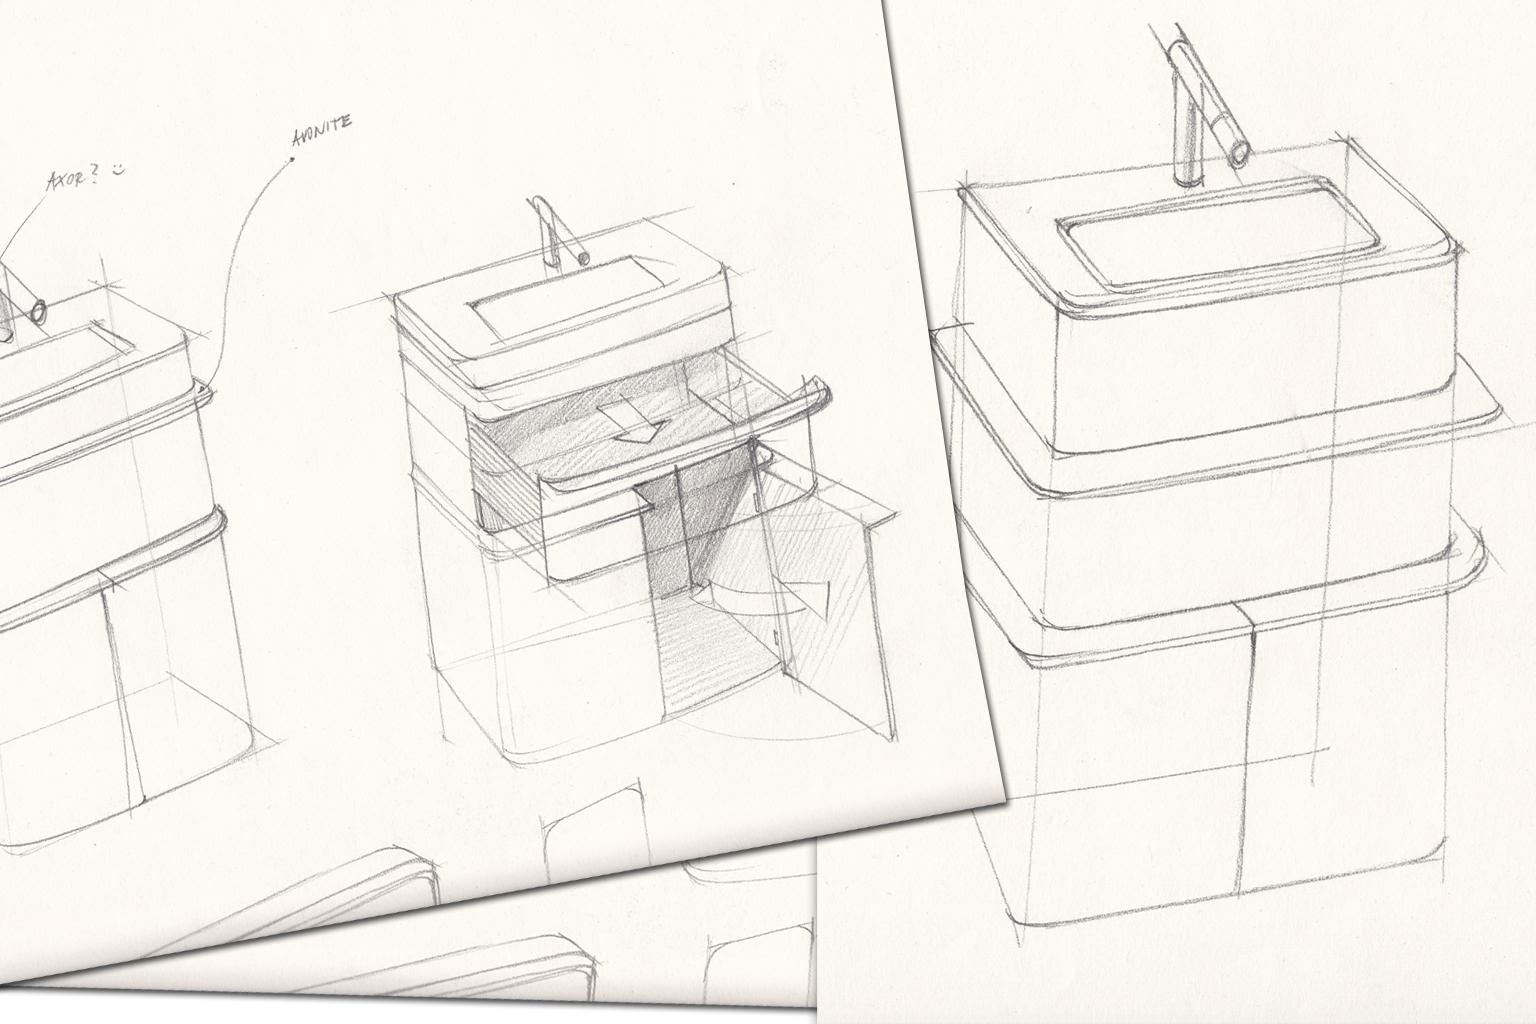 Line Art Bathroom Furniture : Bathroom furniture aqualight from solid surface cetecho